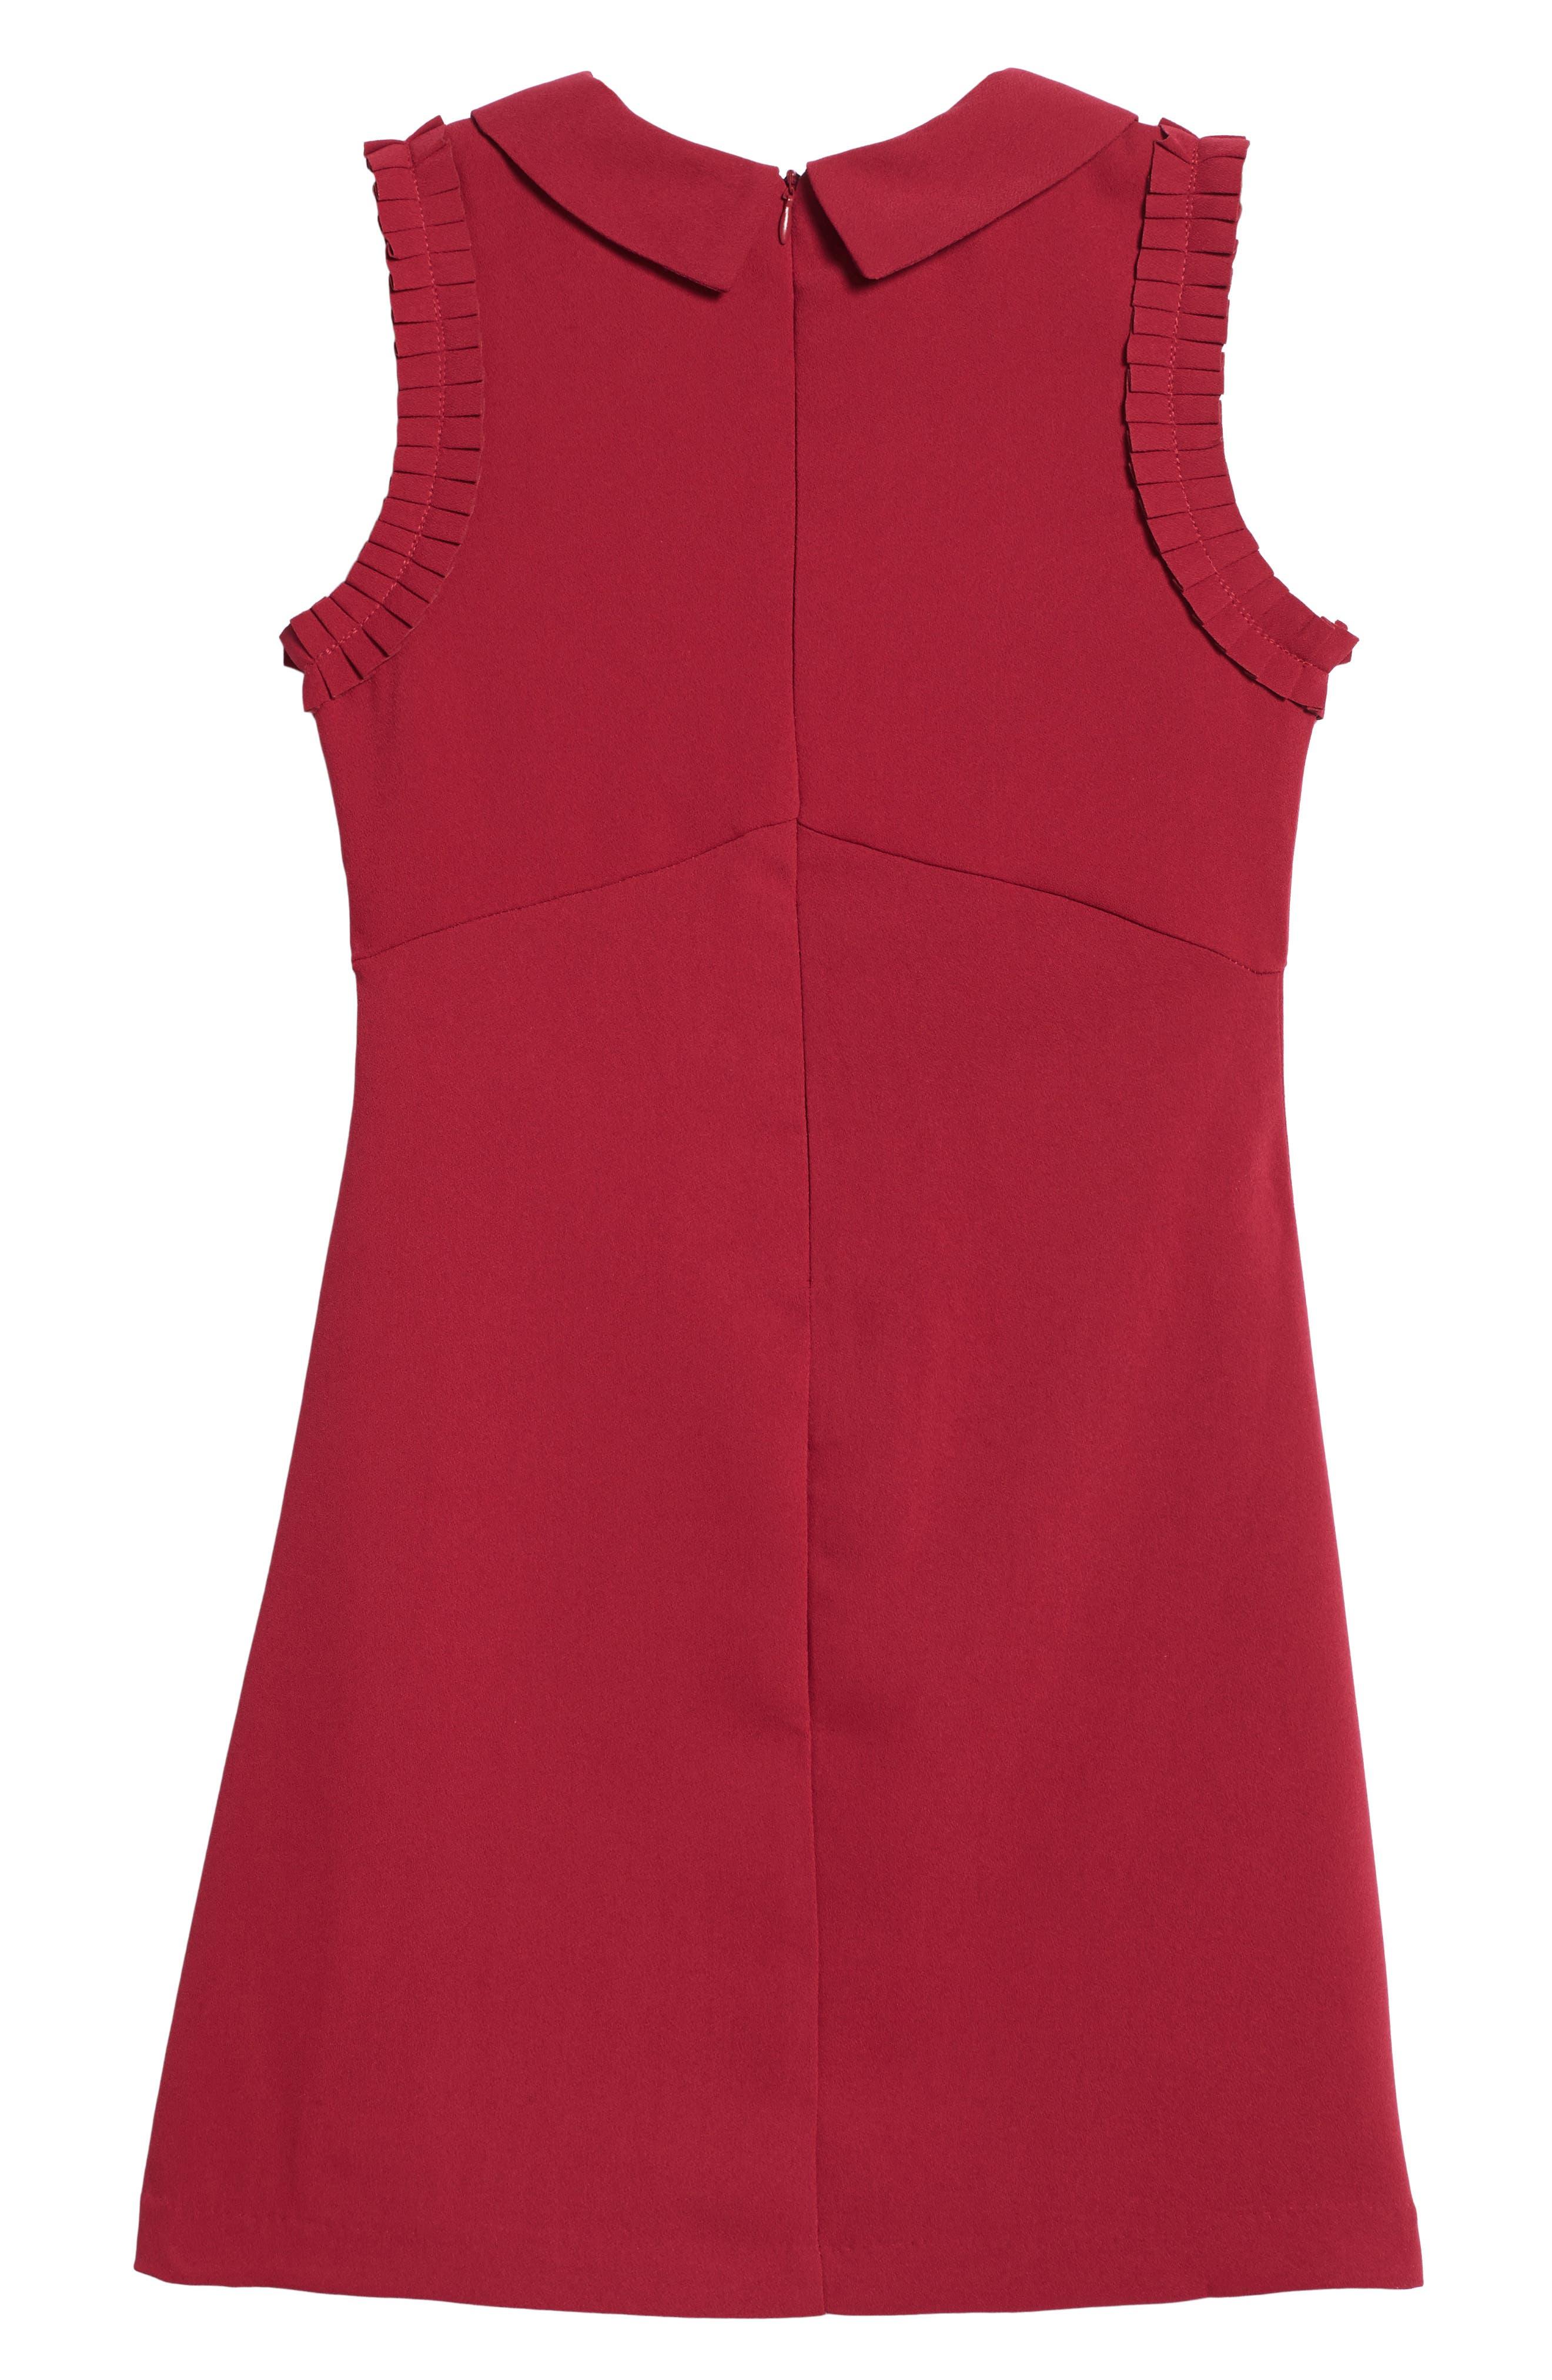 Point Collar Dress,                             Alternate thumbnail 2, color,                             Burgundy